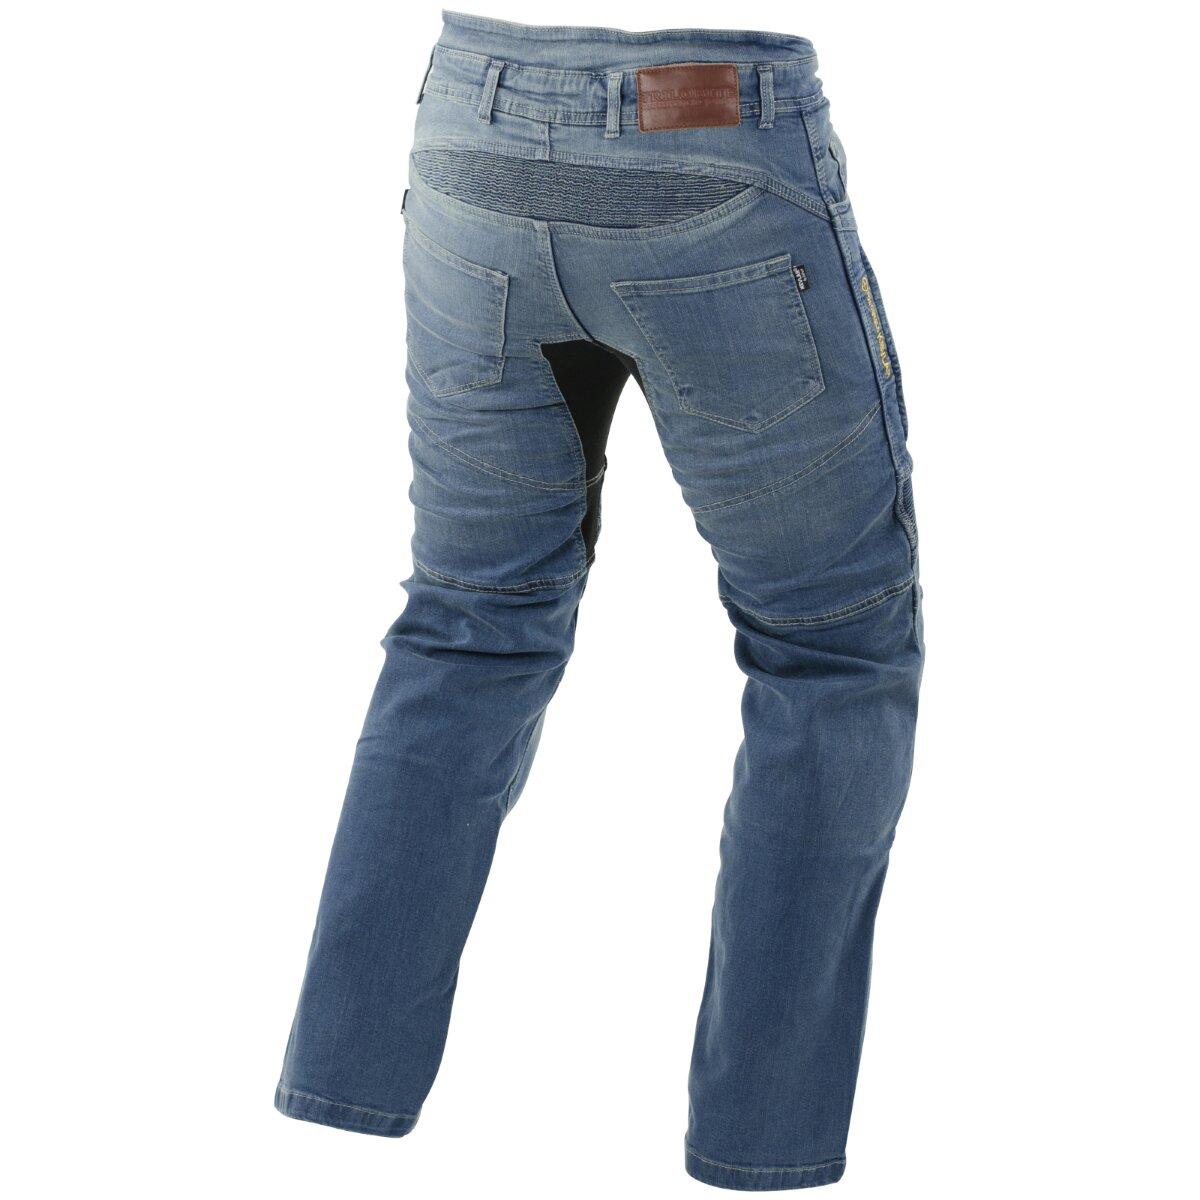 trilobite parado motorrad jeans herren blau wild wear 179 00. Black Bedroom Furniture Sets. Home Design Ideas